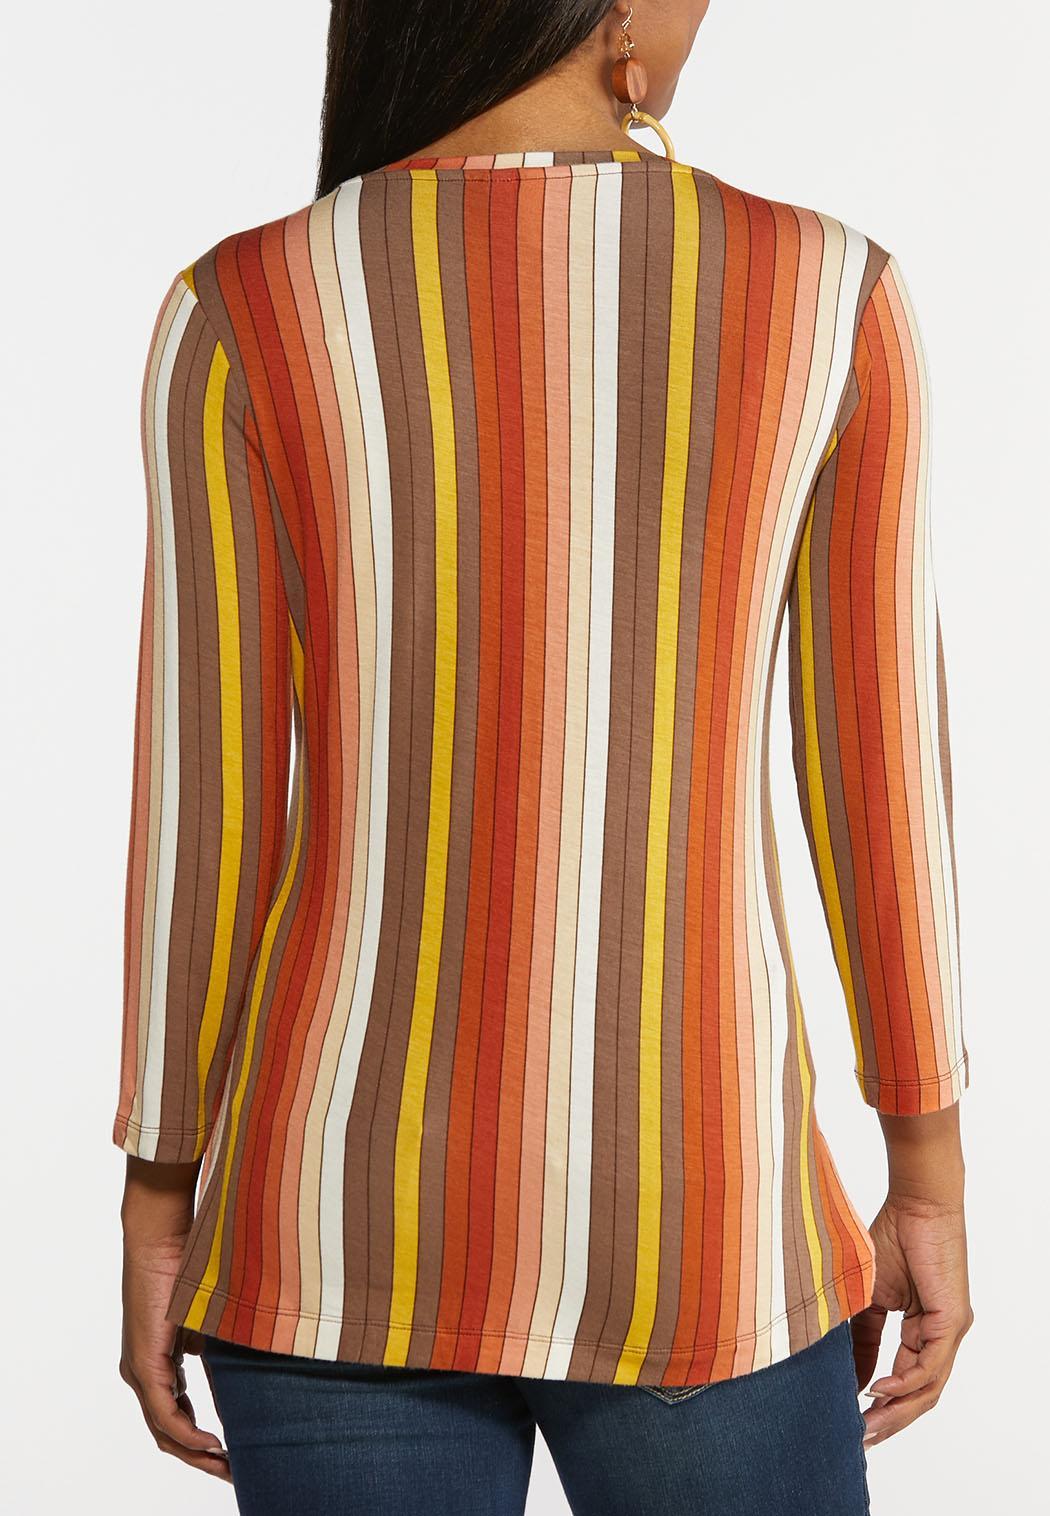 Harvest Stripe Top (Item #44340282)